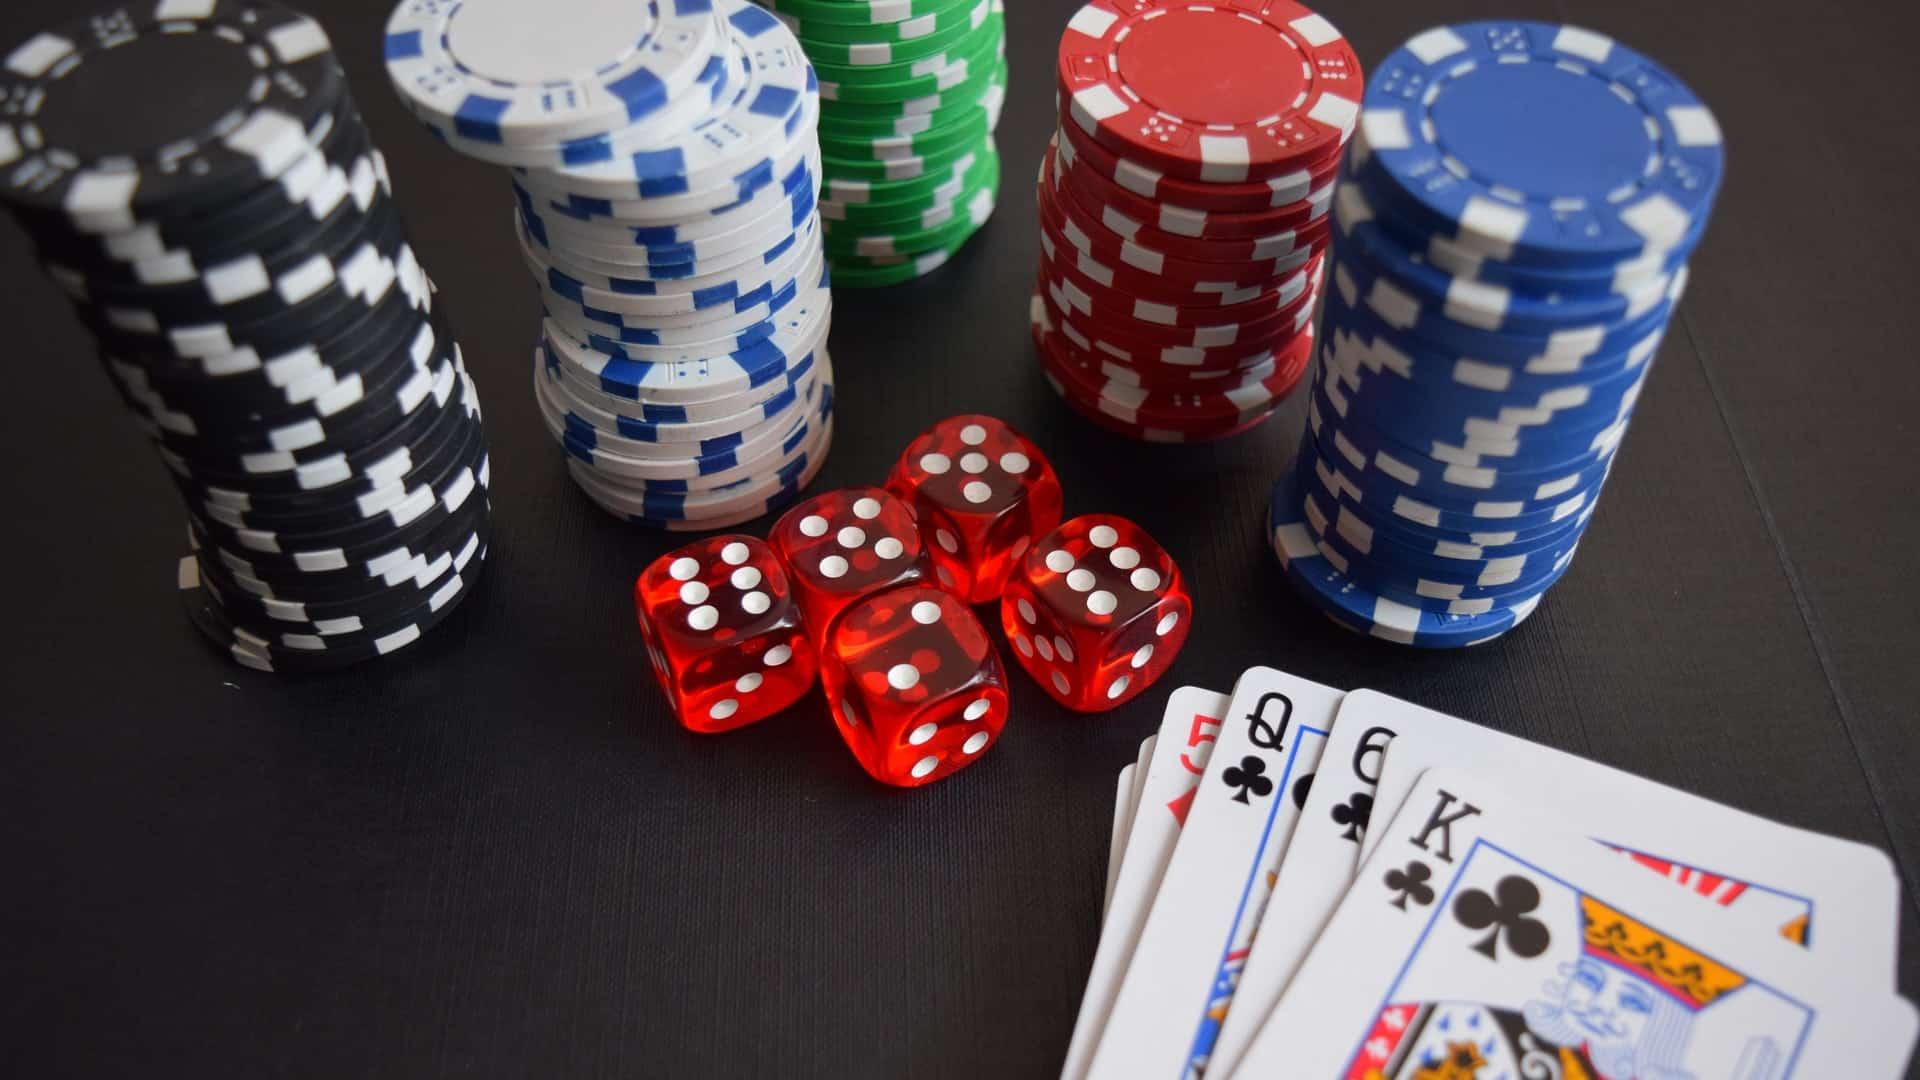 relax gambling laws